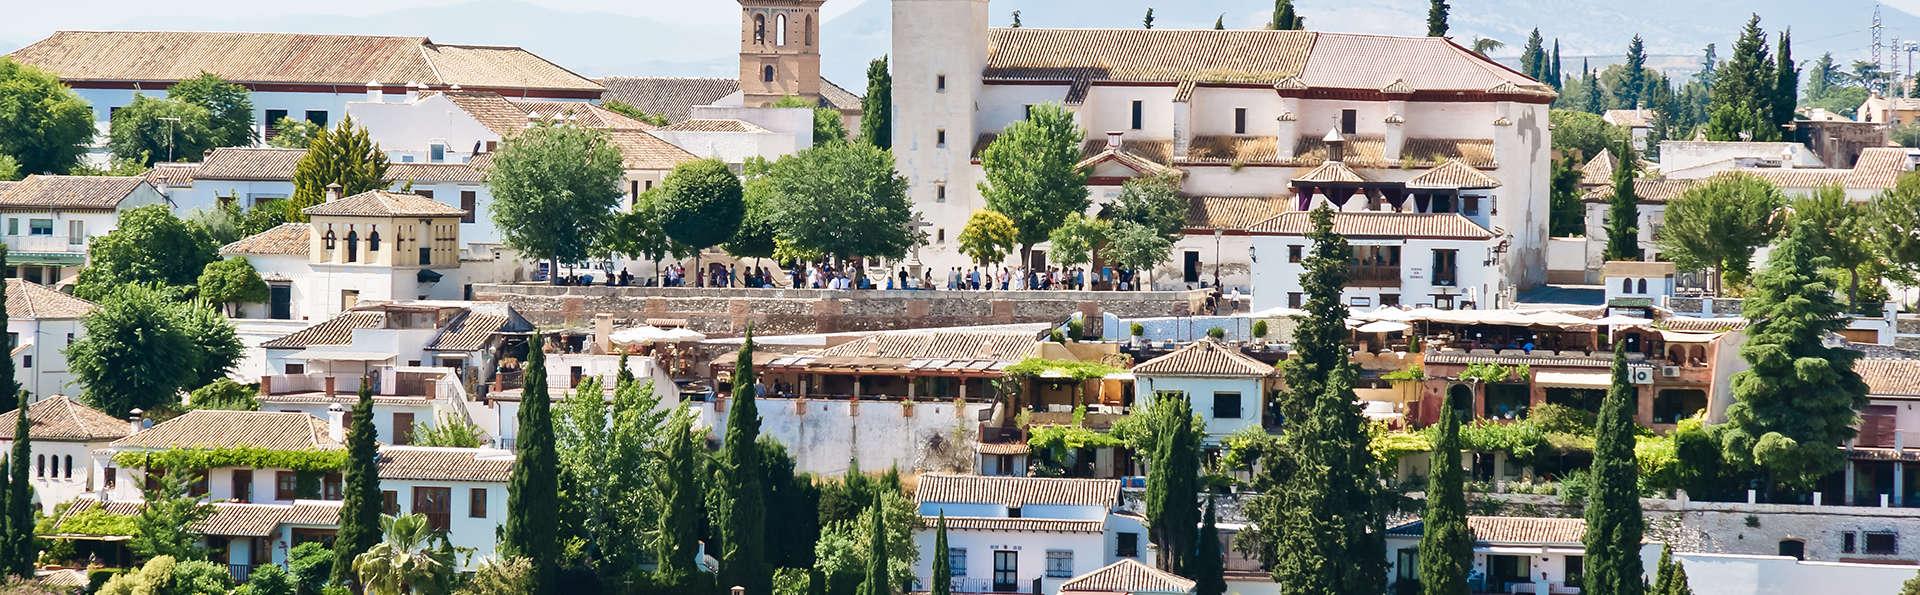 Palacio de Almagra - edit_Fotolia_99959295_granada.jpg